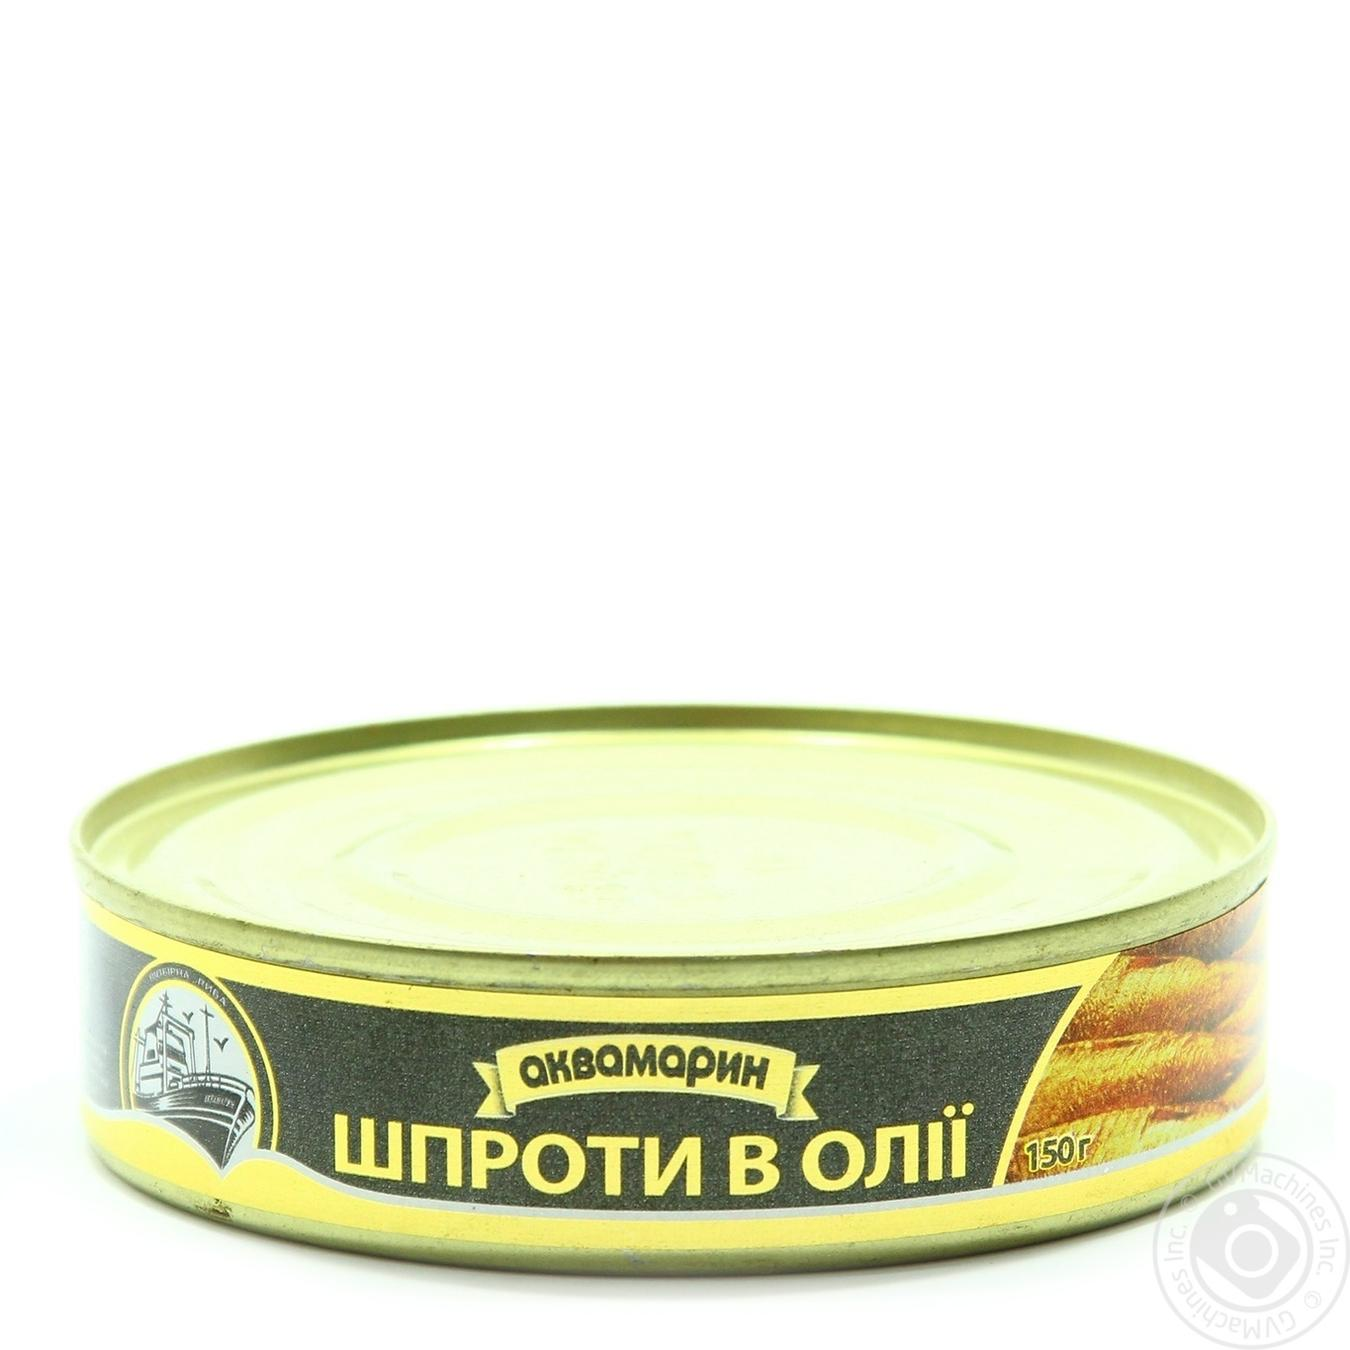 Купить АКВА ШПРОТИ В/М 150ГР